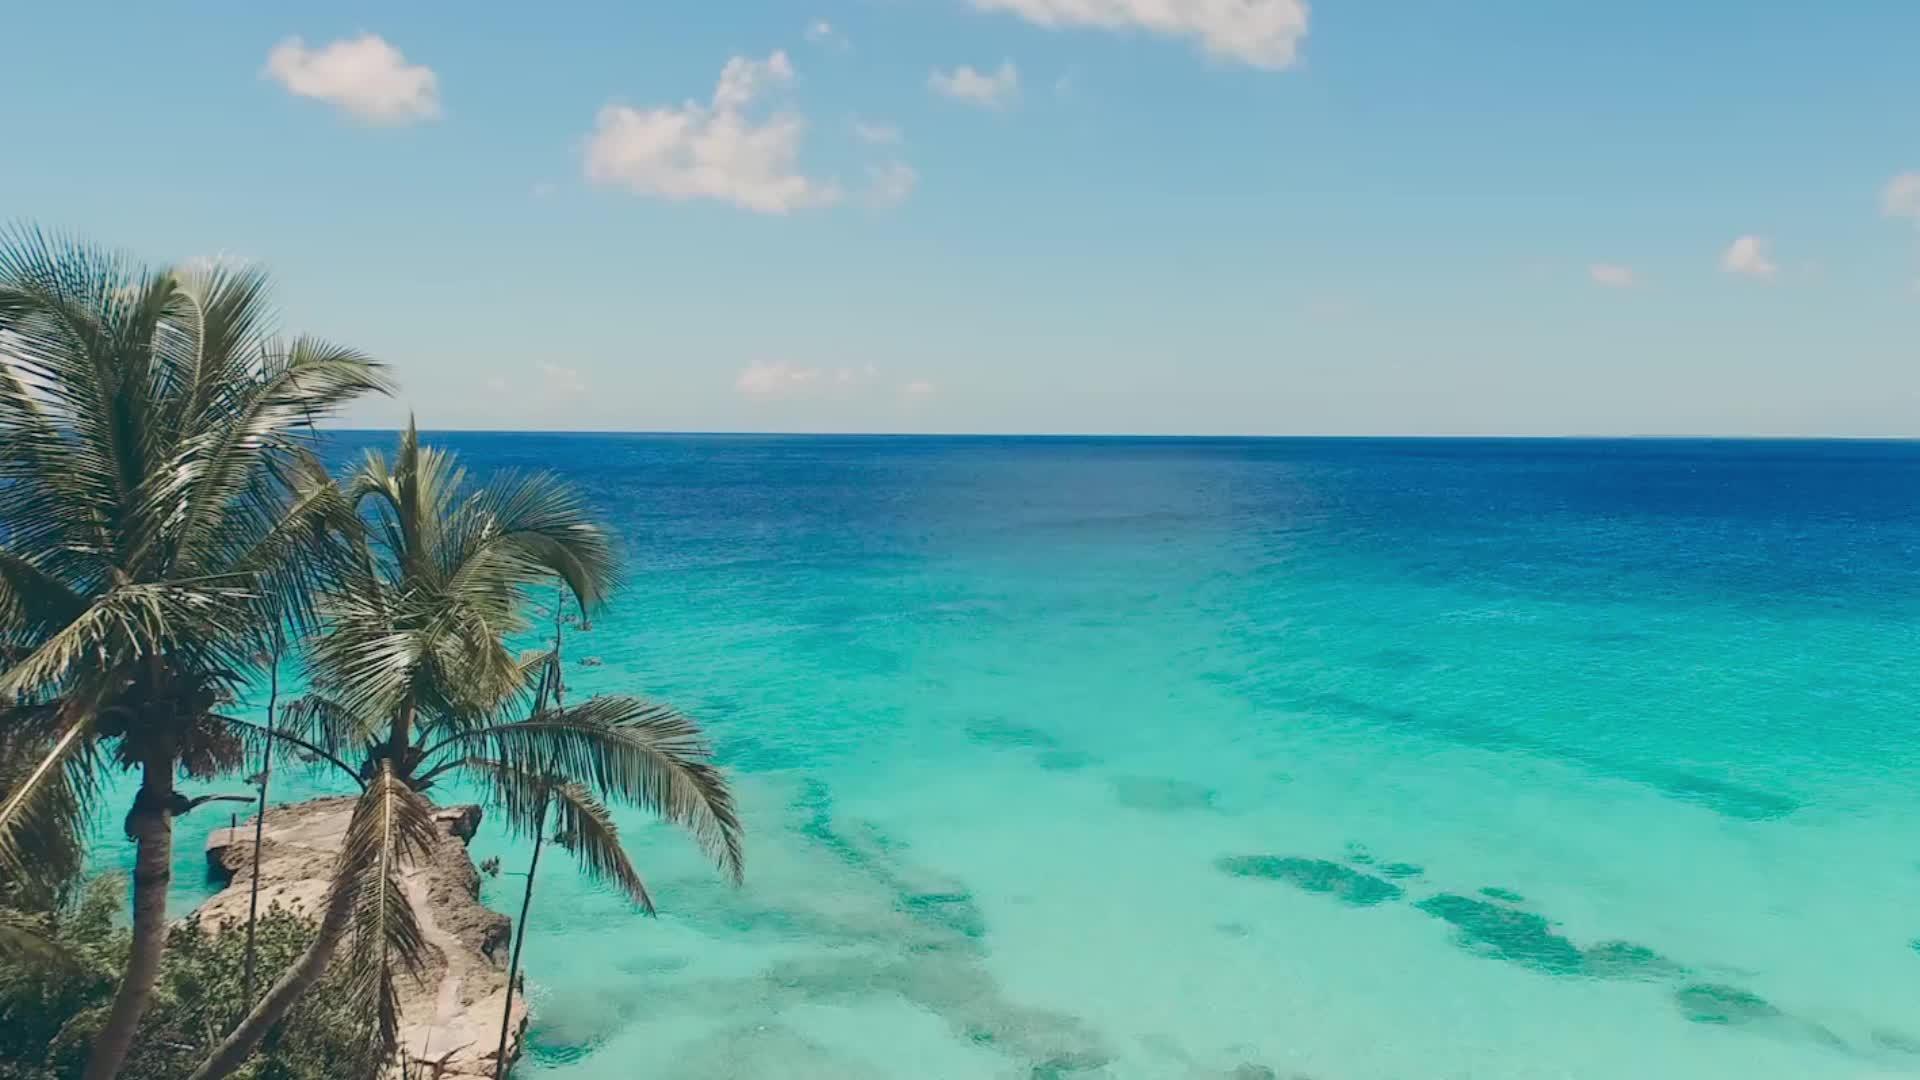 Malliouhana Resort, a Luxury Caribbean Auberge Hotel